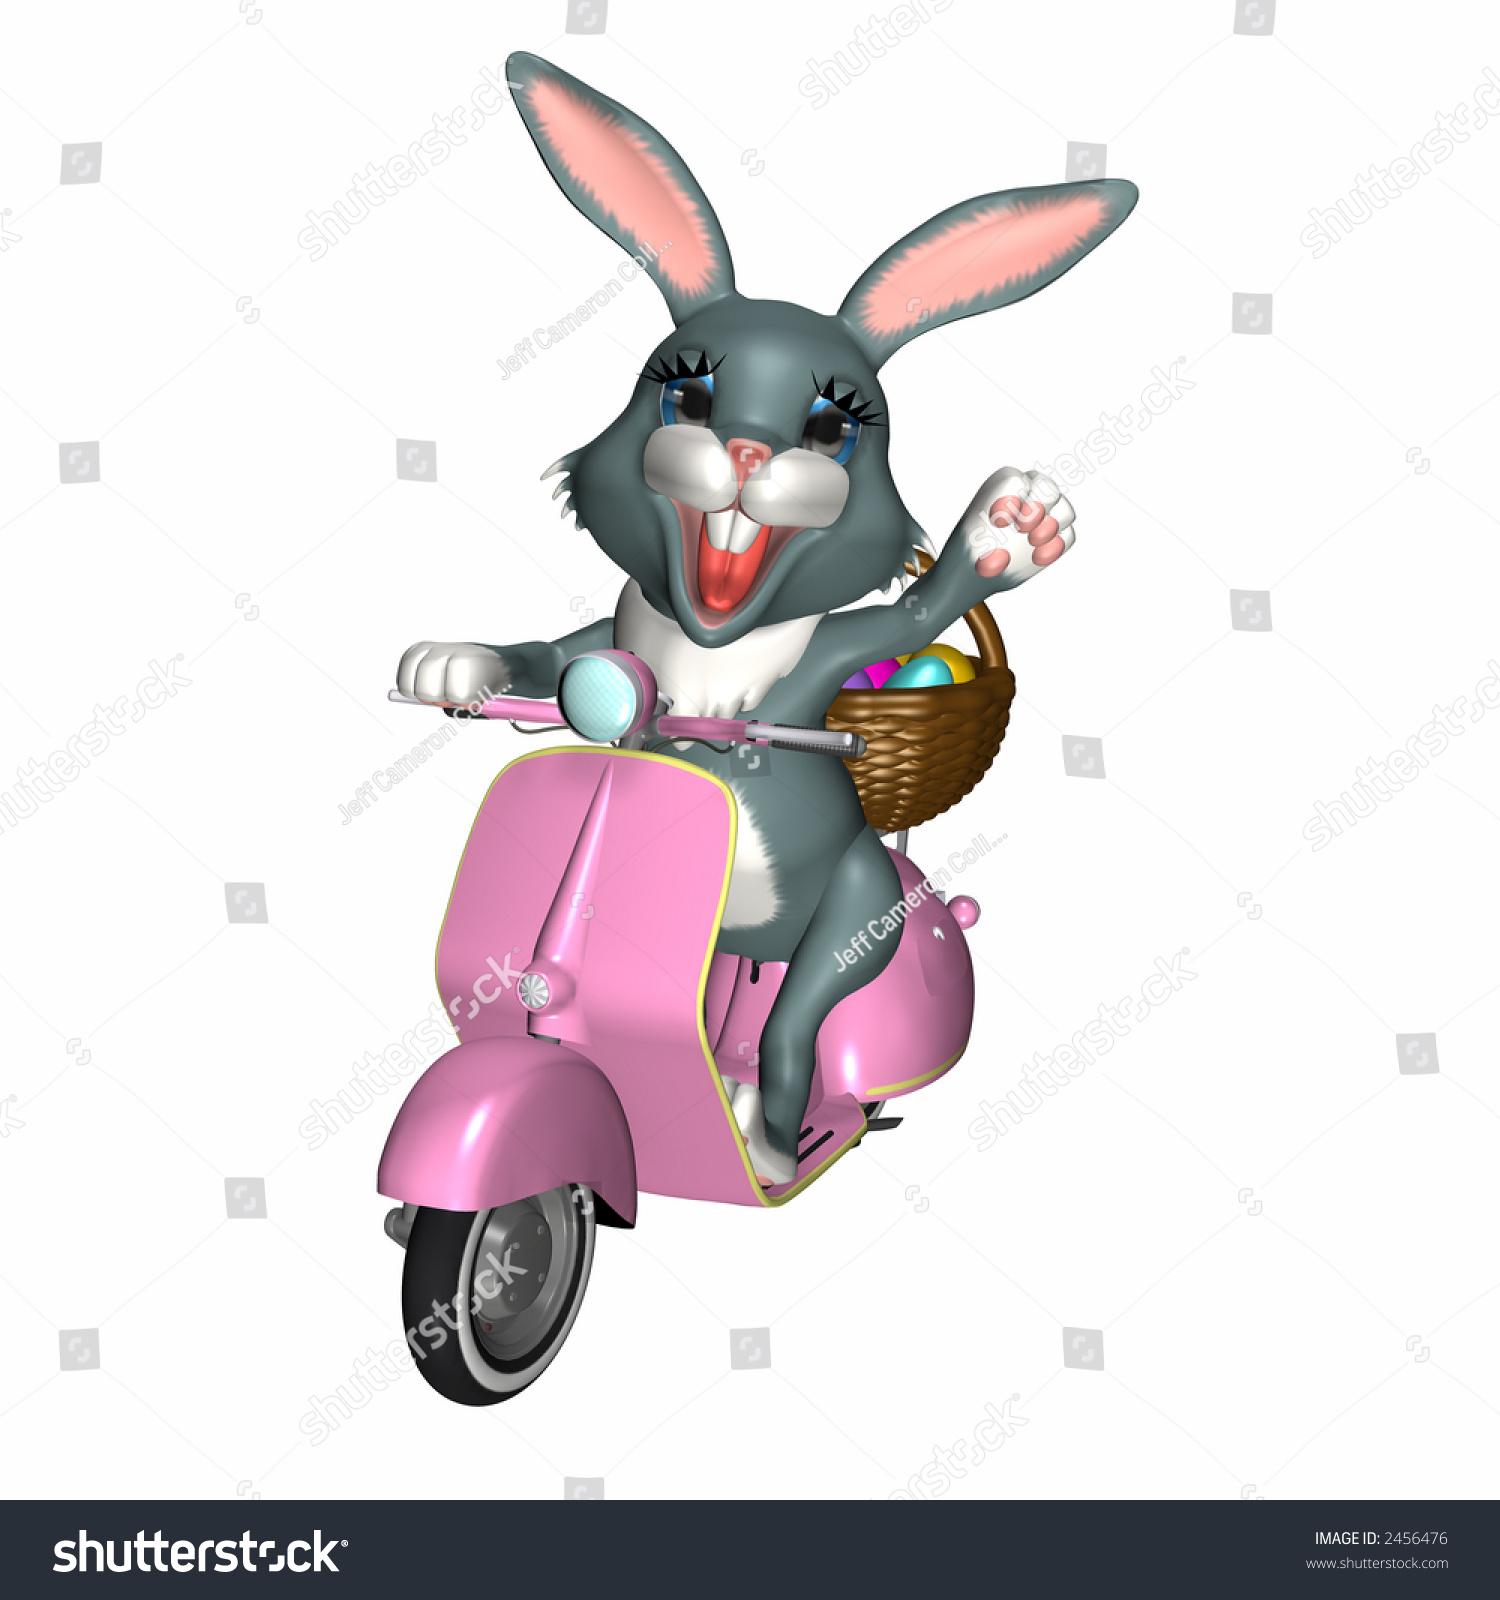 Easter Bunny Delivering His Basket Eggs Stock Illustration 2456476